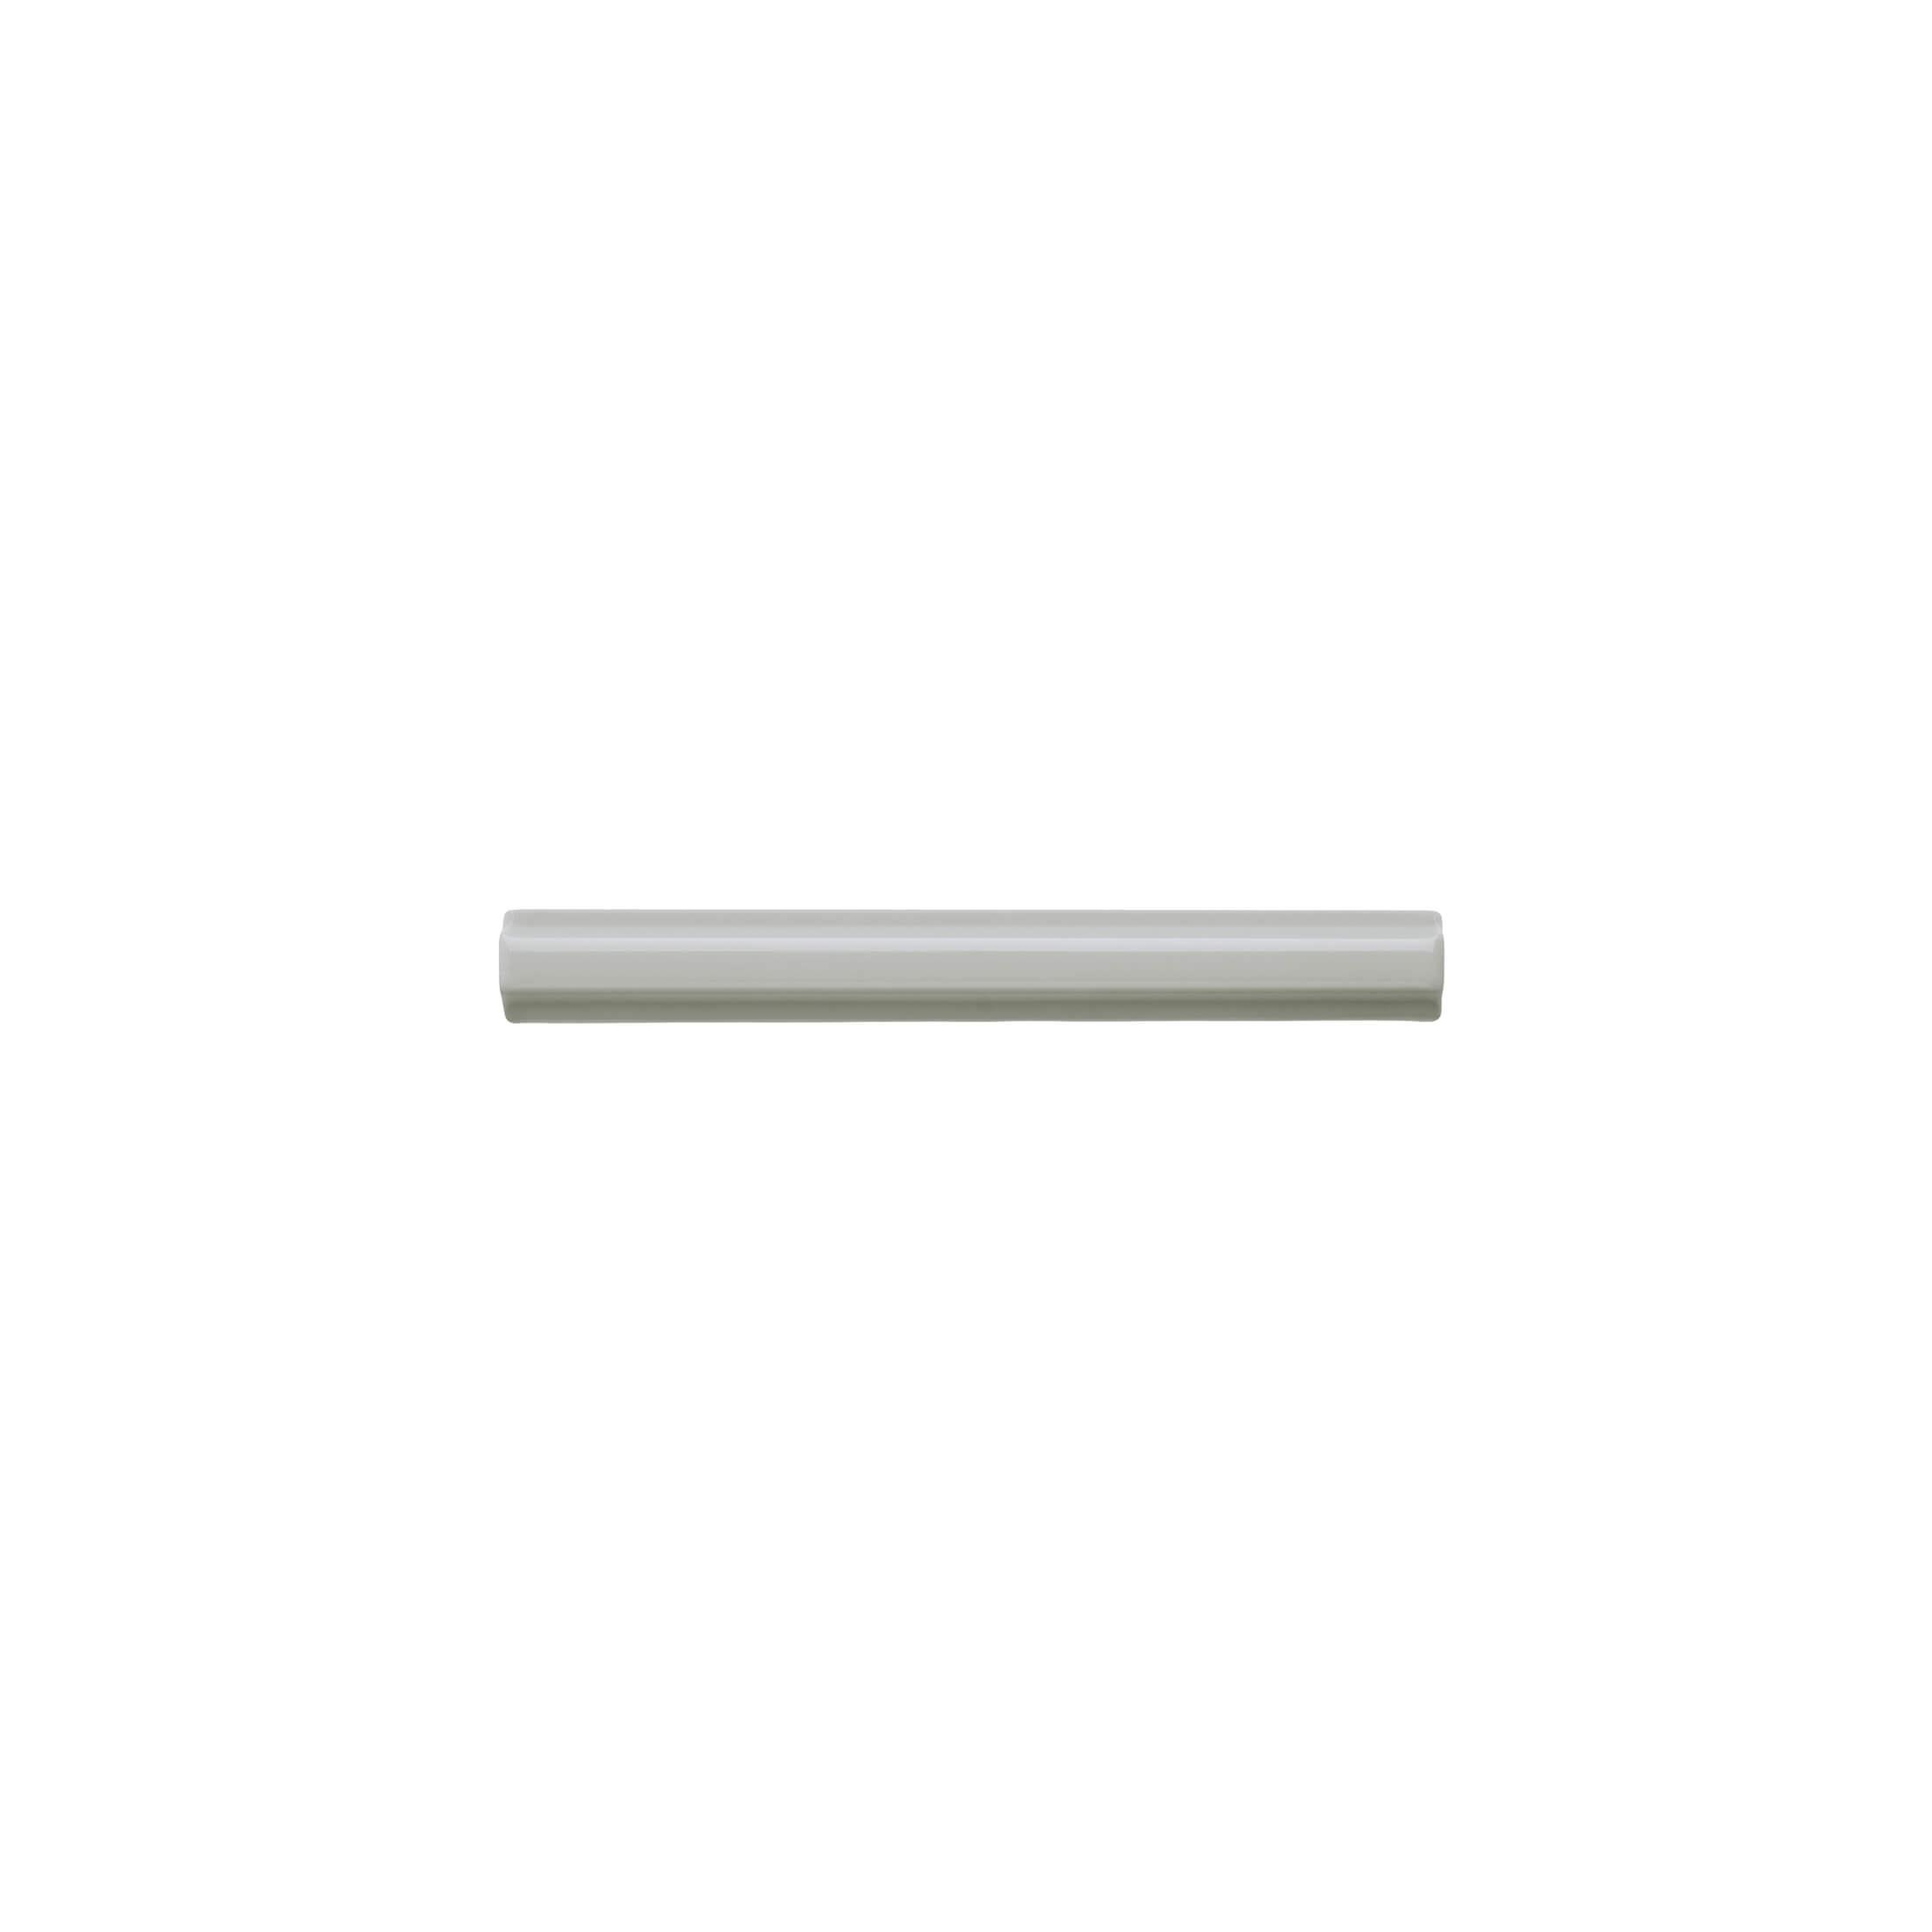 ADNE5496 - LISTELO CLASICO - 1.7 cm X 15 cm